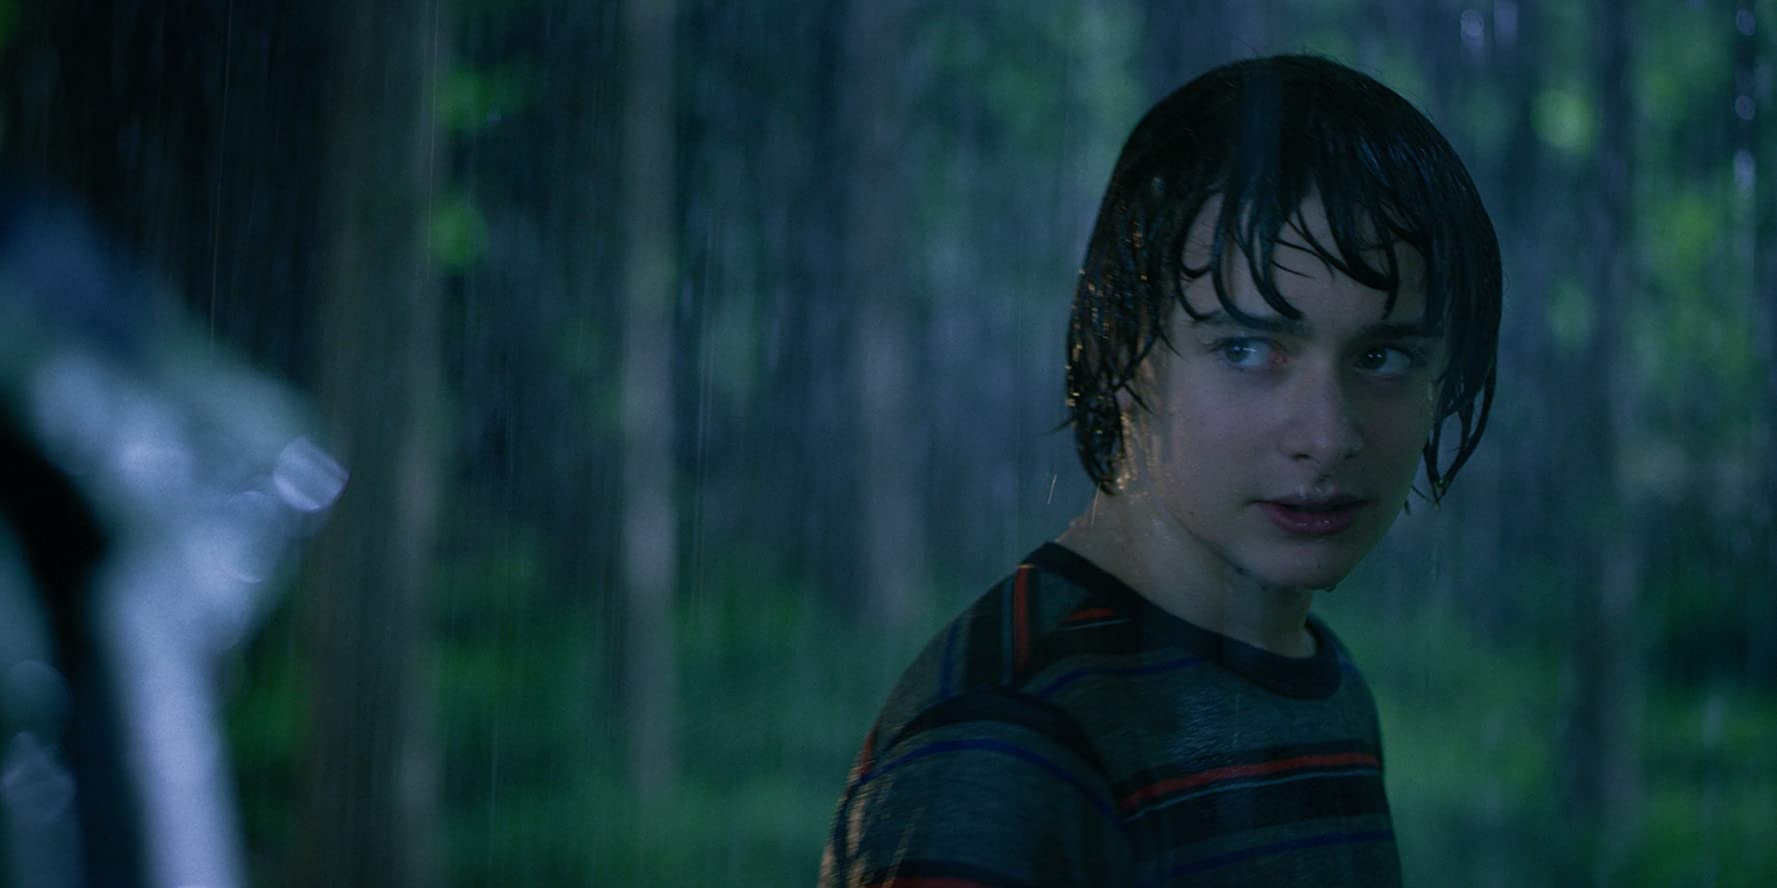 Noah Schnapp in Stranger Things (2016)